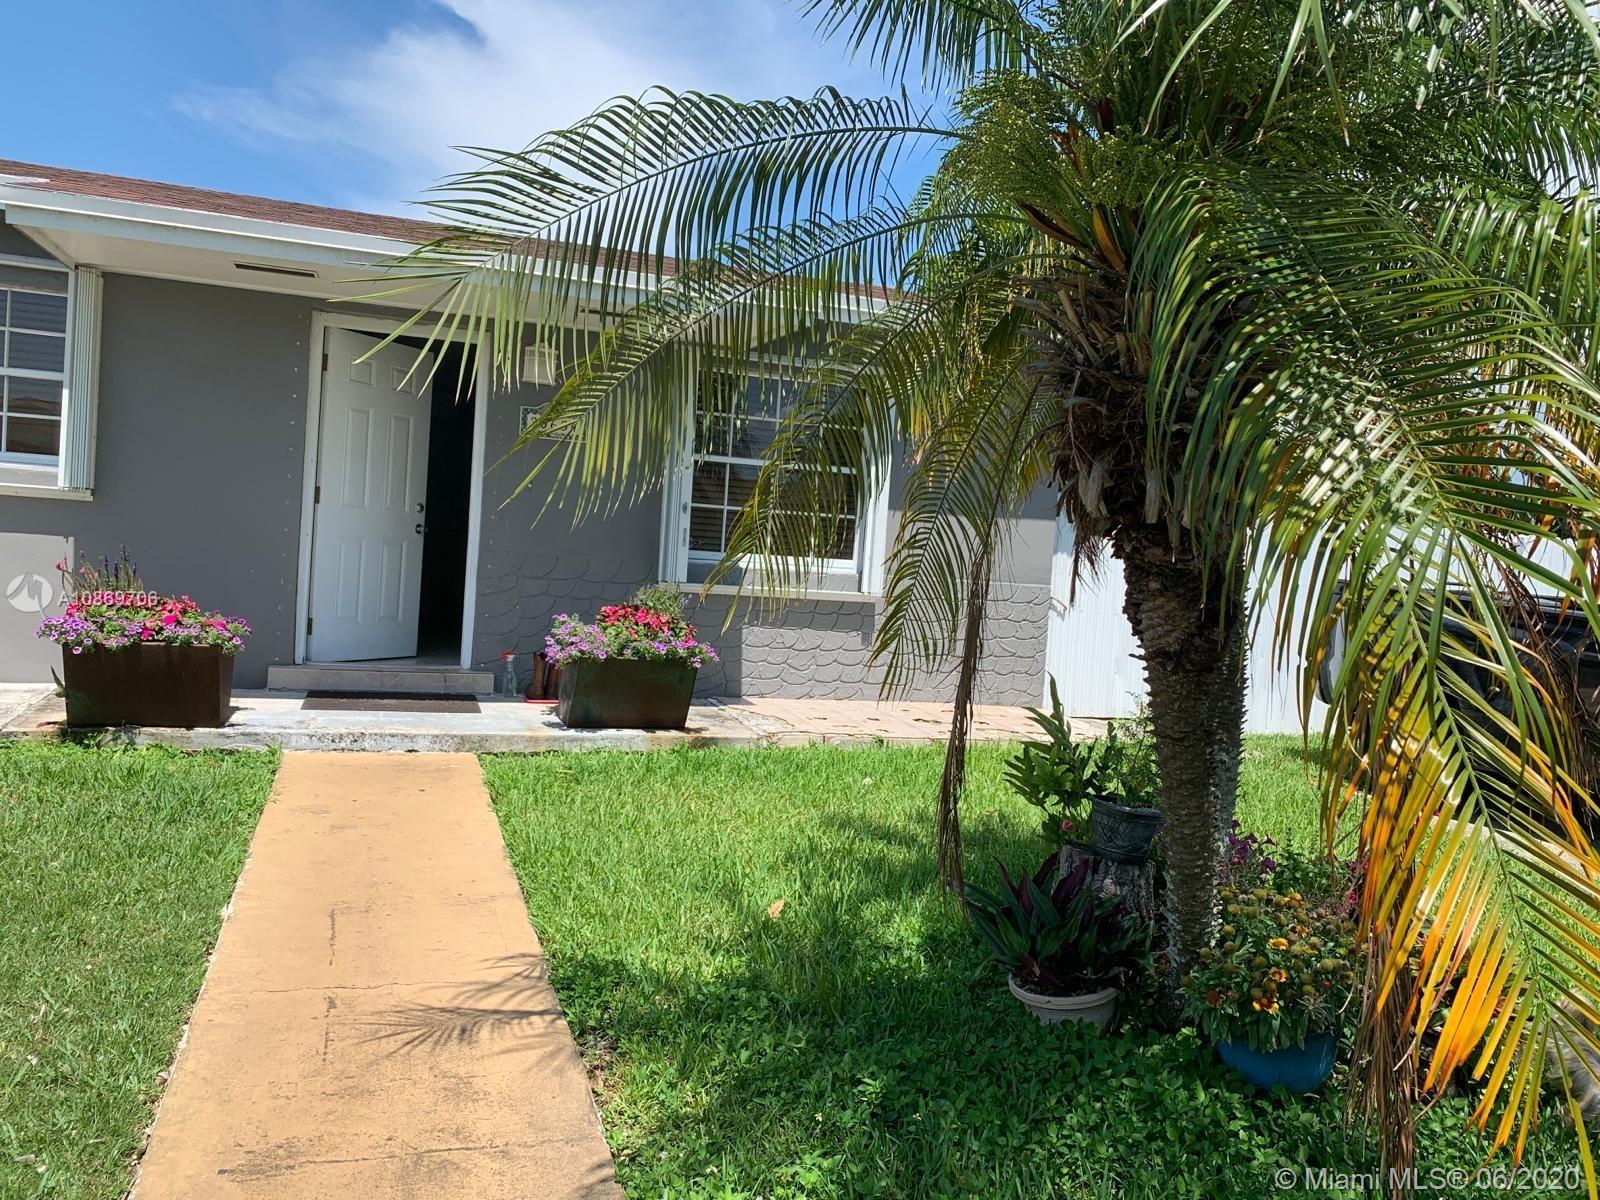 30634 SW 152nd Ct, Homestead, FL 33033 - Homestead, FL real estate listing